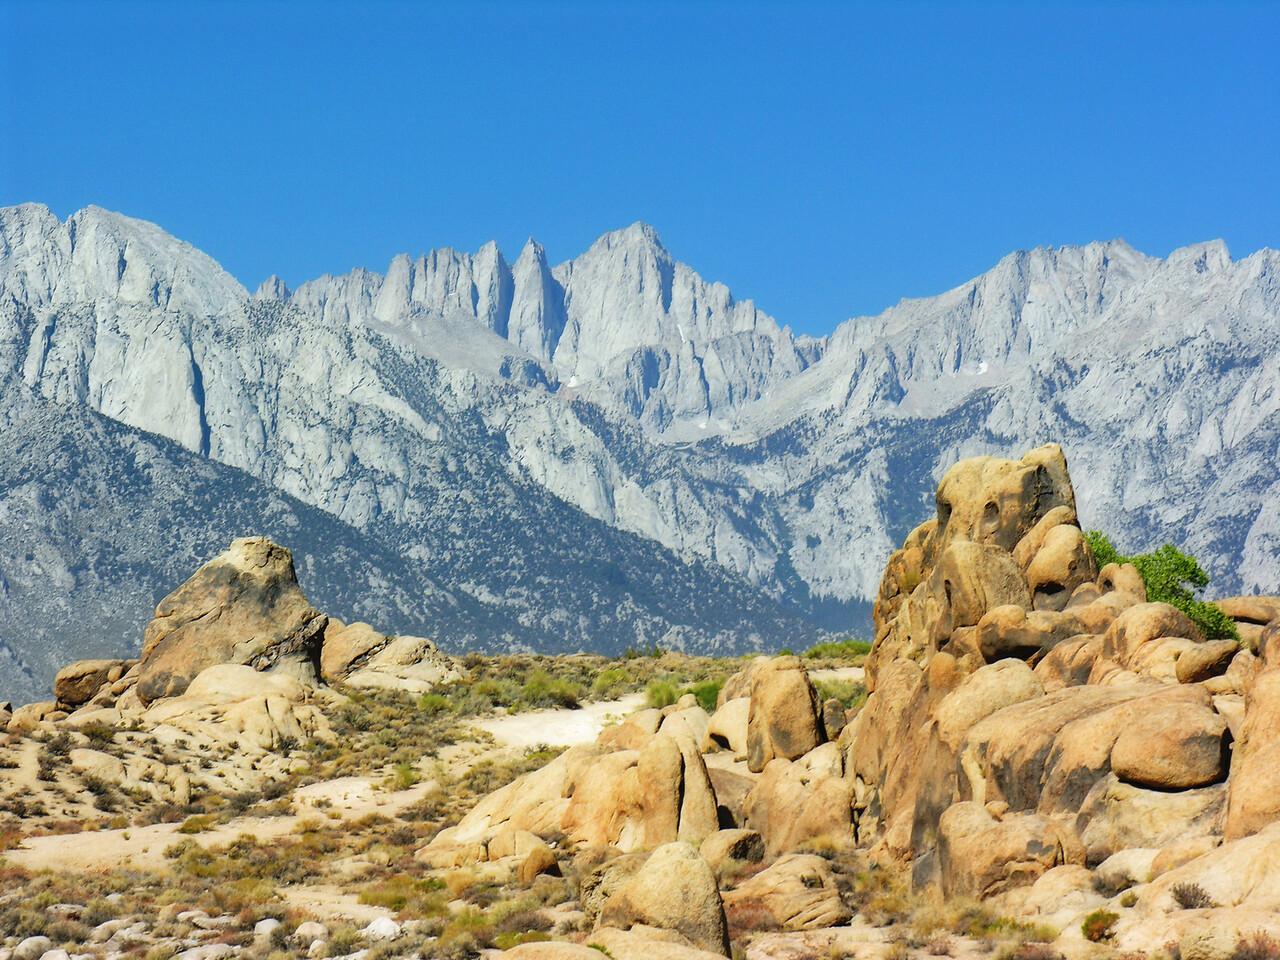 Alabama Hills & Sierra Nevada